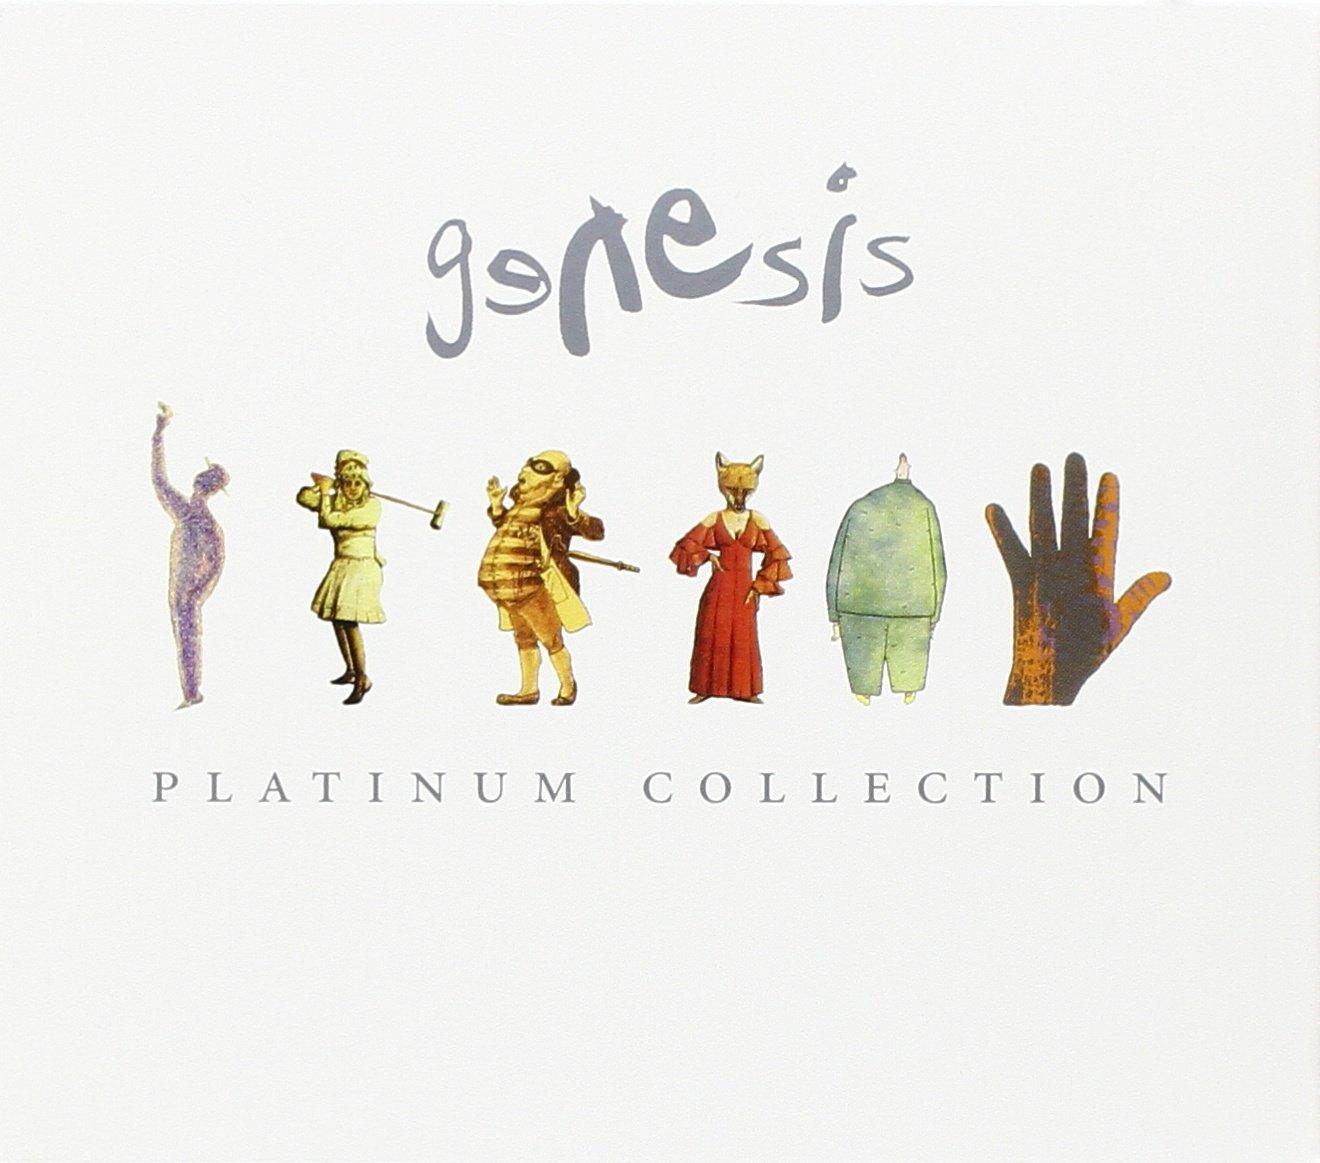 Genesis the Platinum Collection